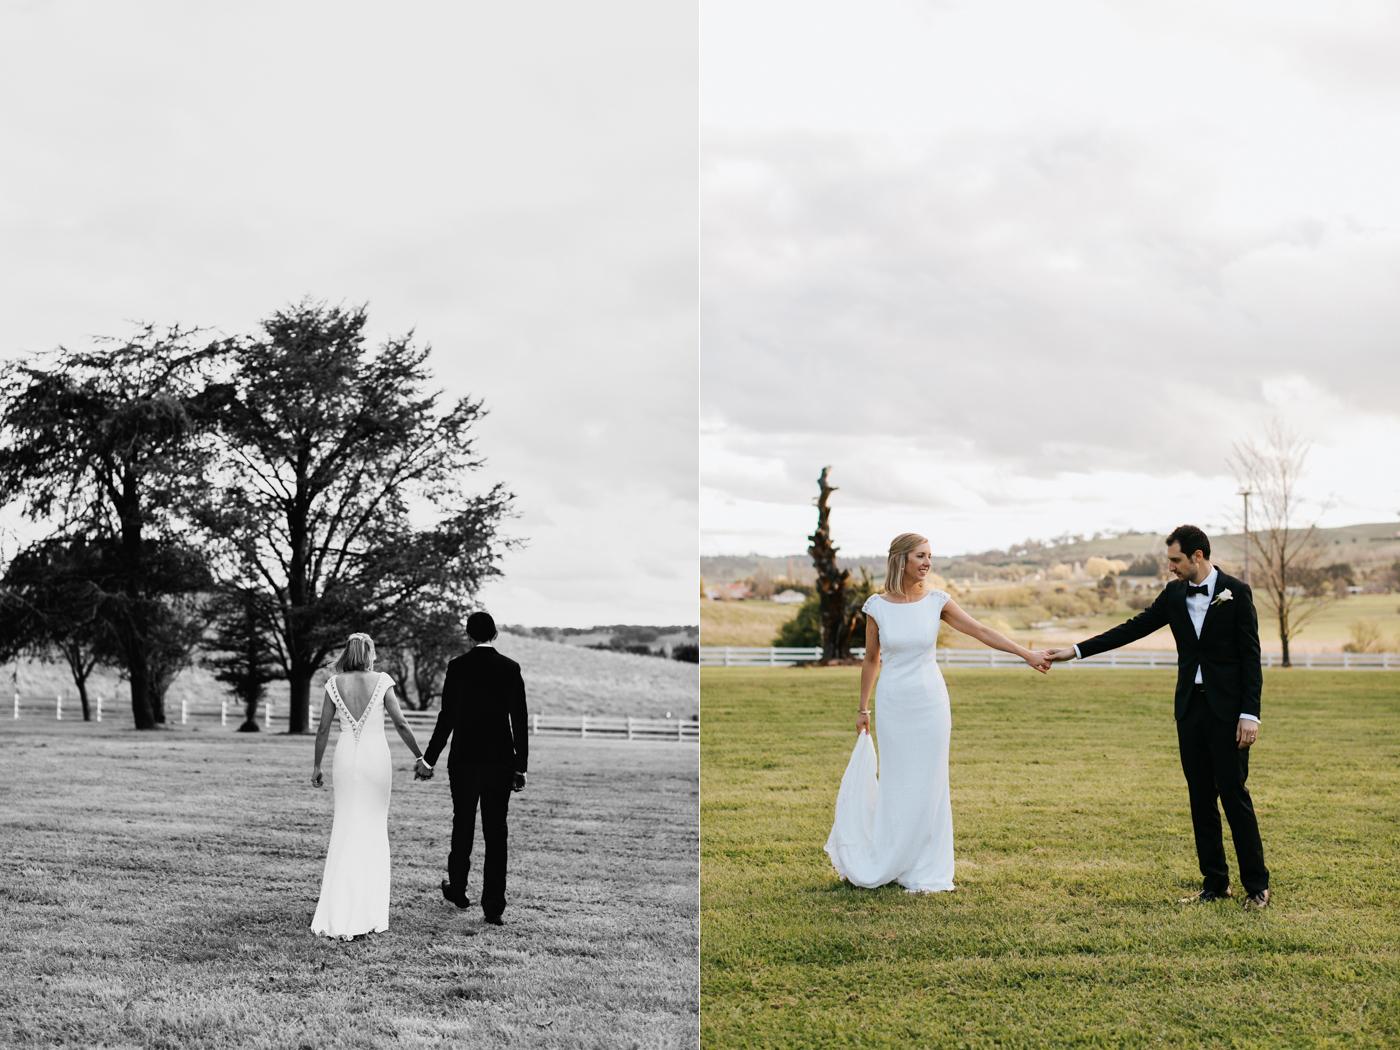 Bridget & James - Orange Country Wedding - Samantha Heather Photography-152.jpg